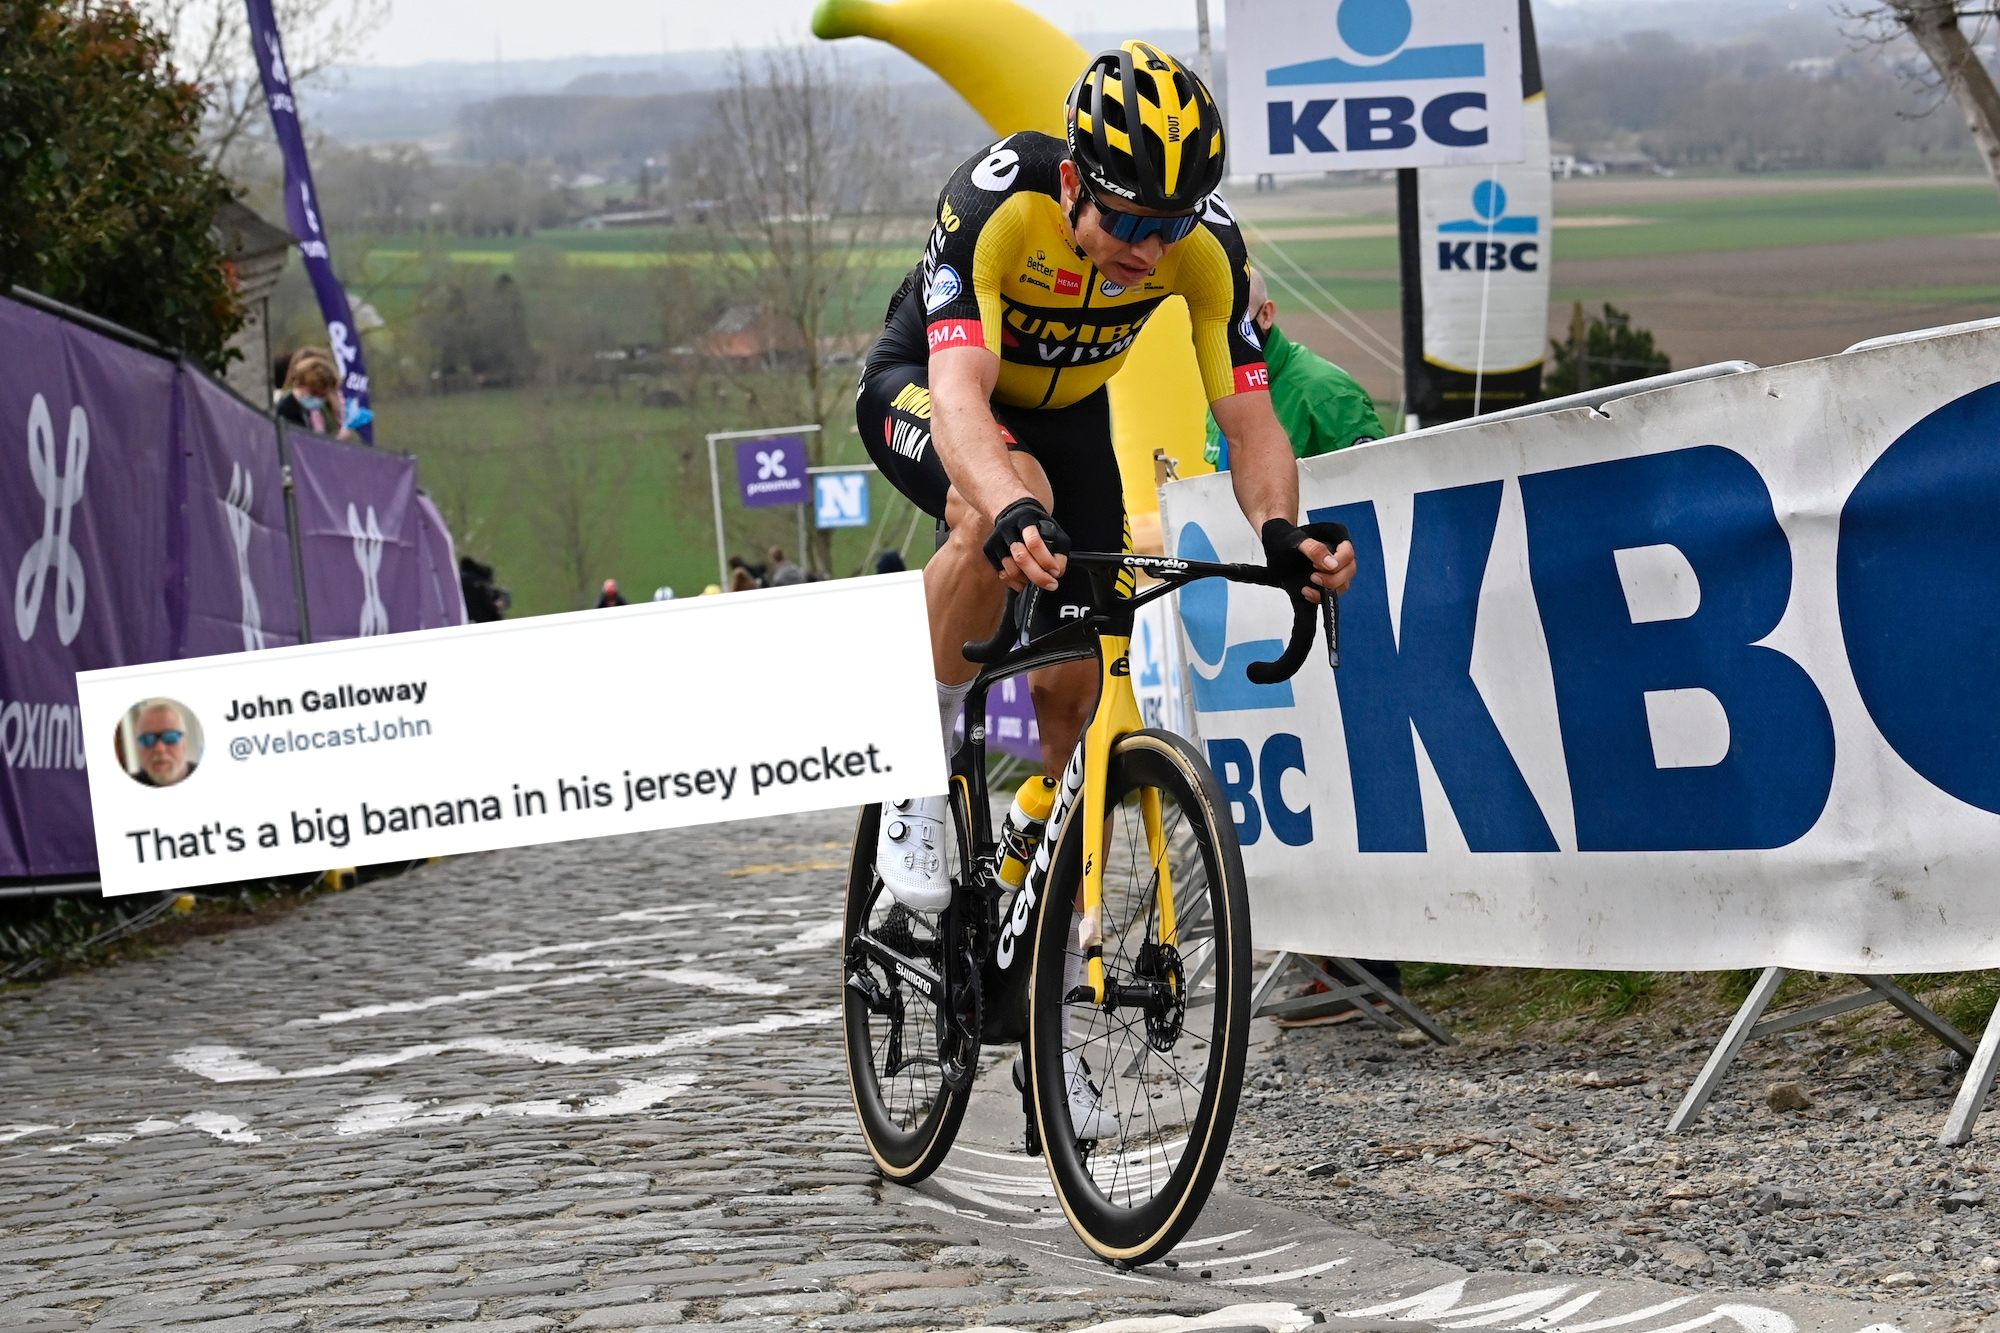 Tweets of the week: the Cavendish comeback, Emma Norsgaard's post-Flanders blues, and Wout van Aert's banana